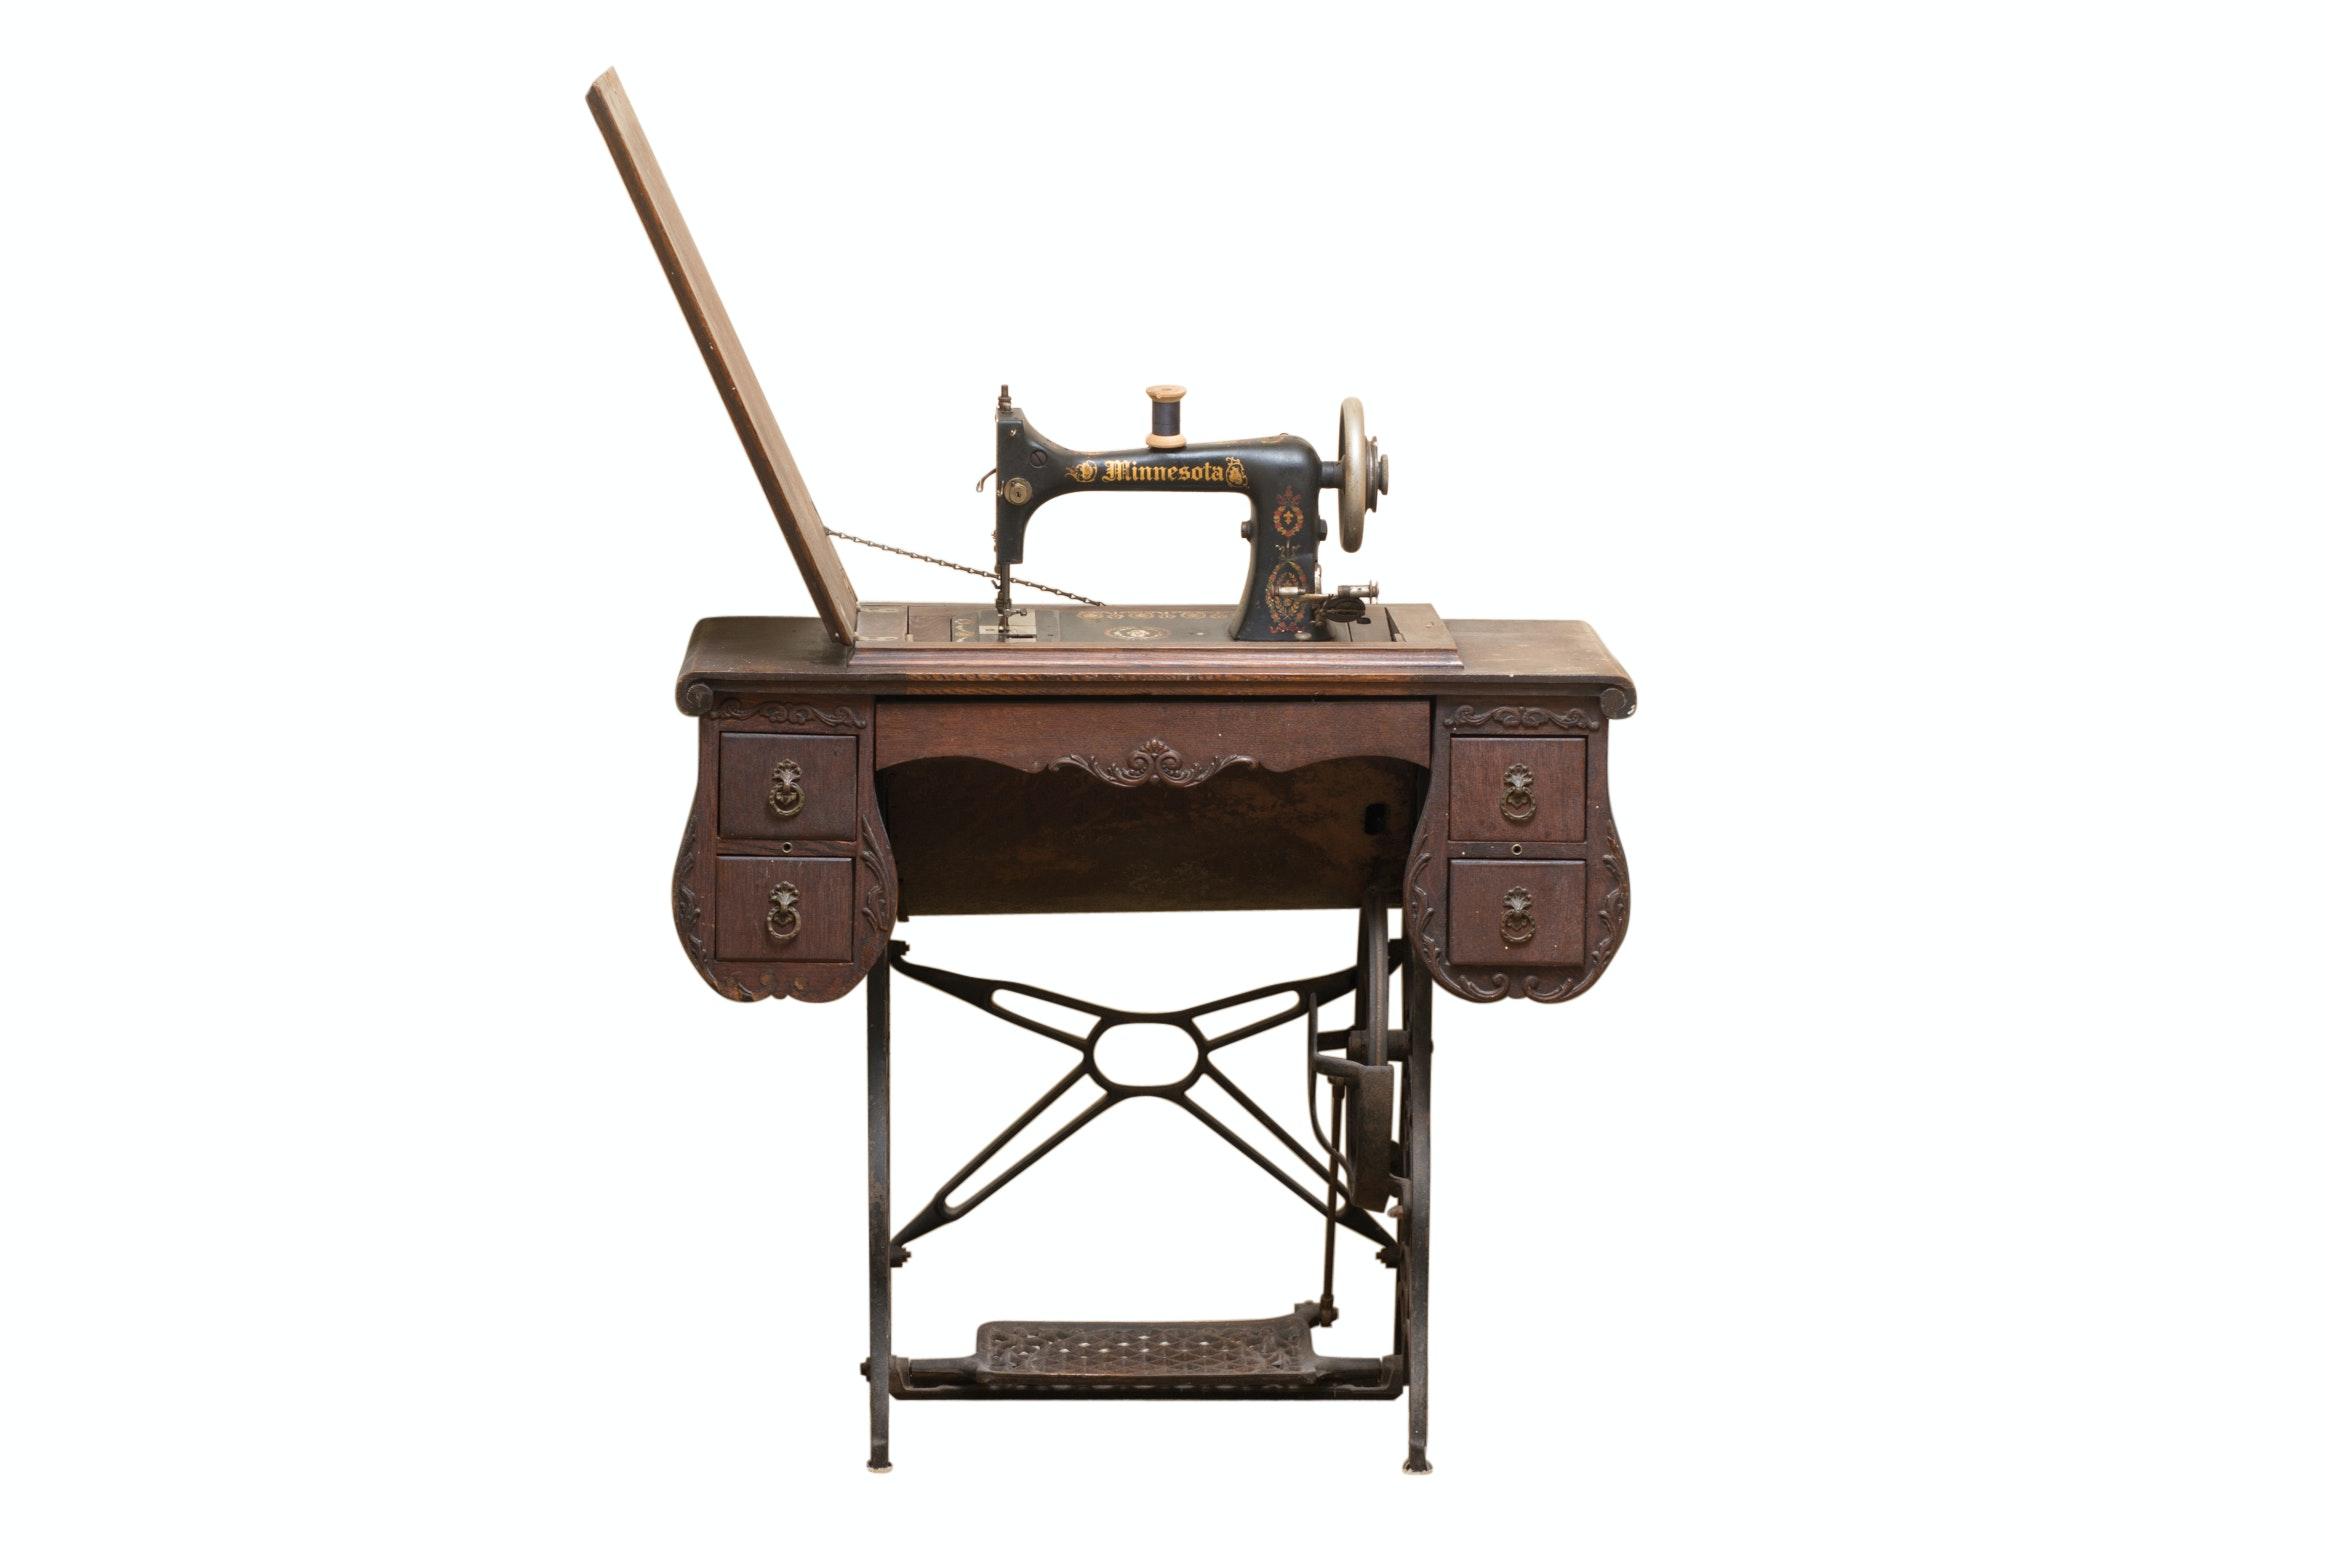 Antique Minnesota Sewing Machine